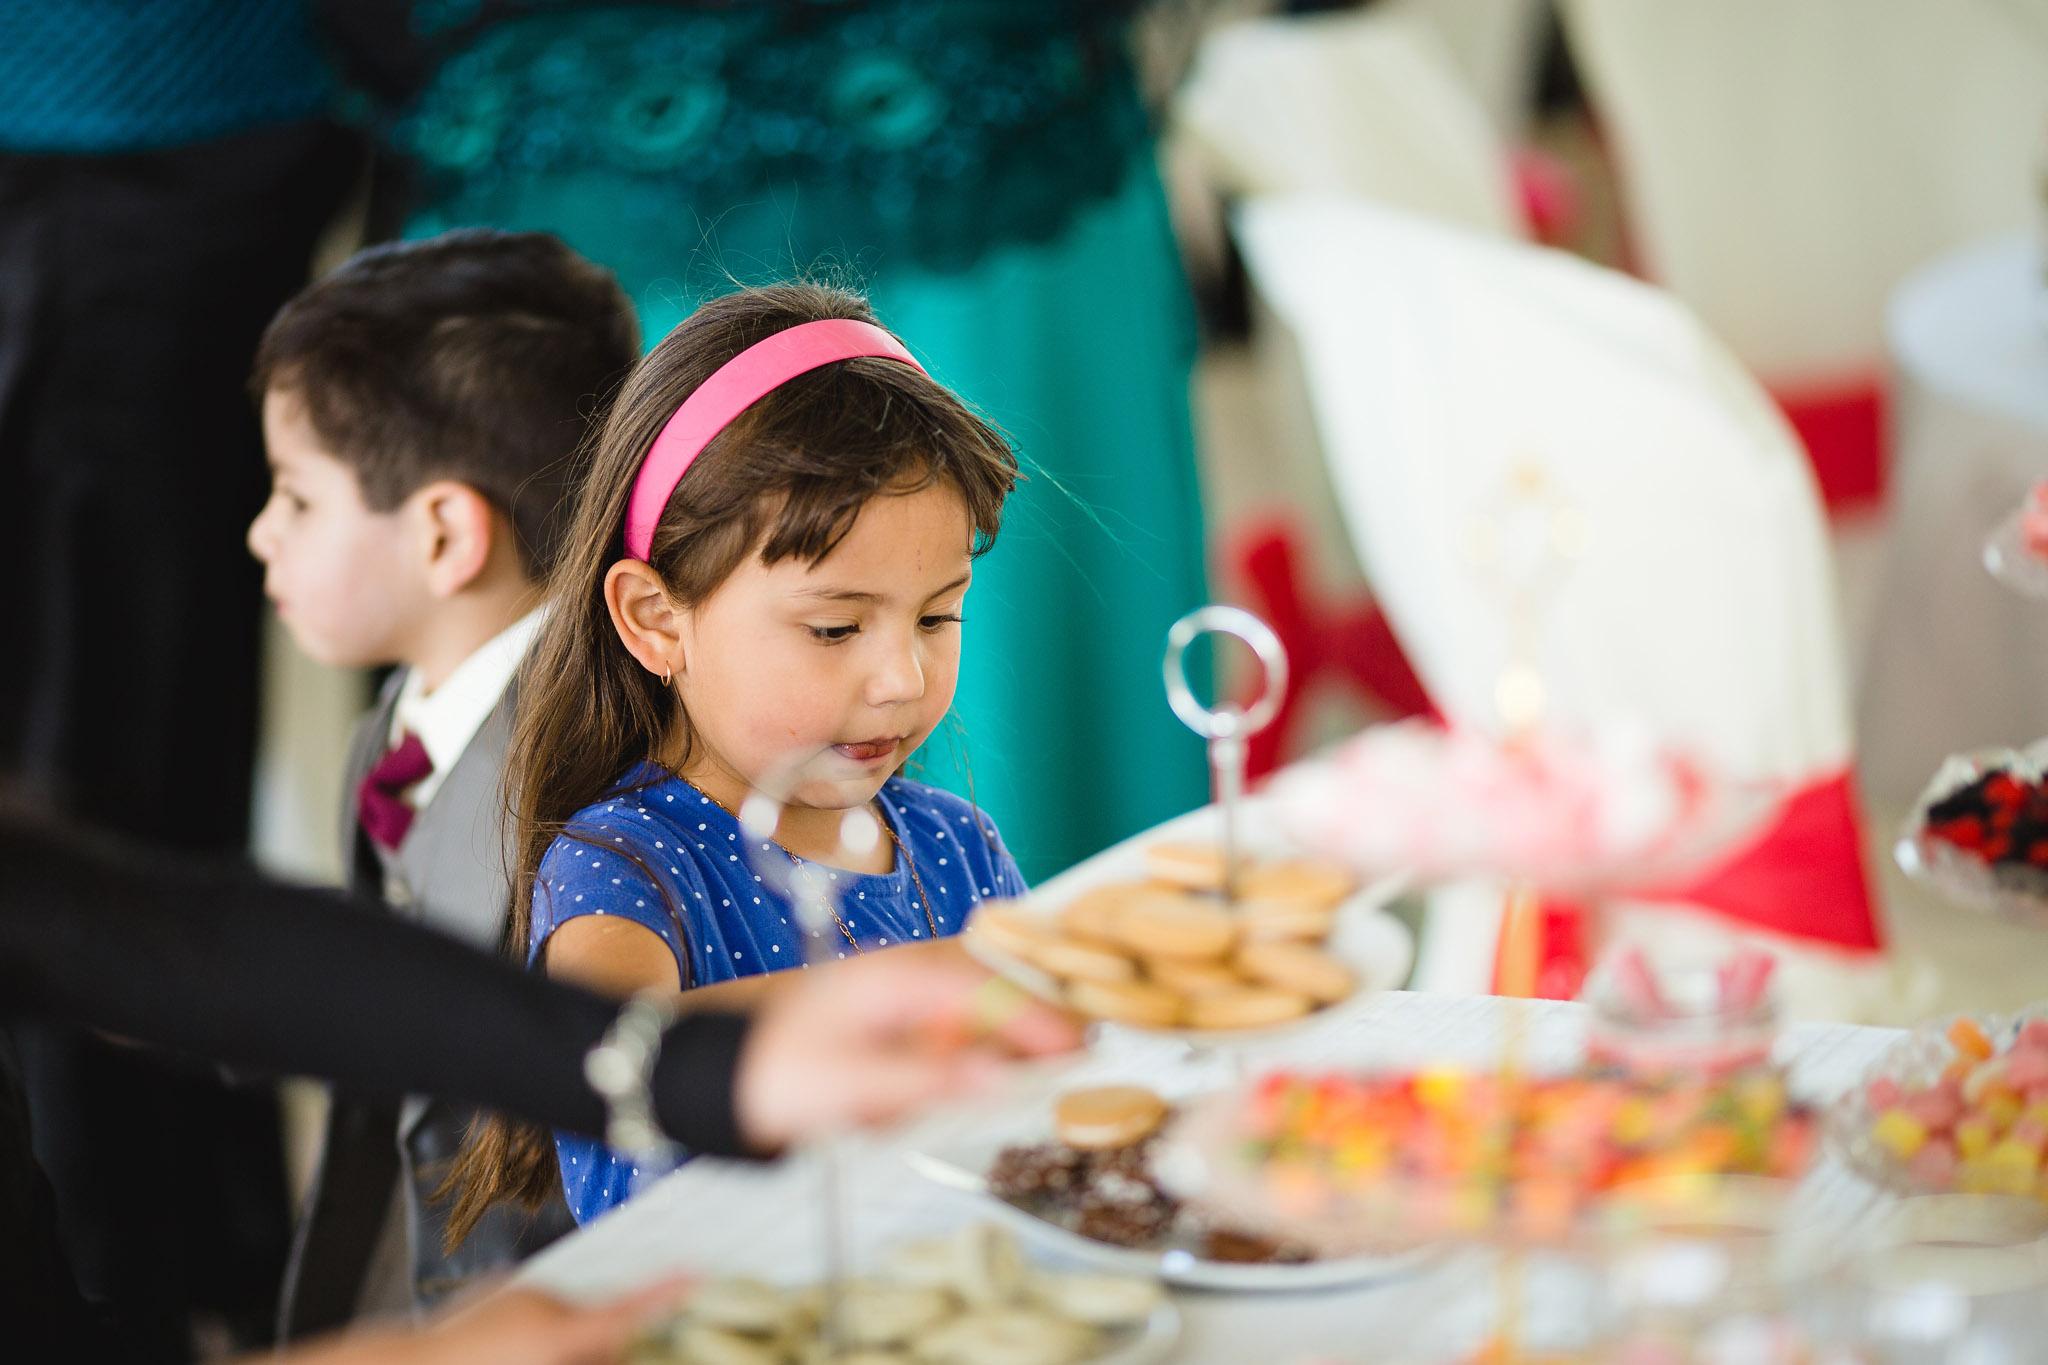 wedding-bolivia-la-paz-candy-bar-kids